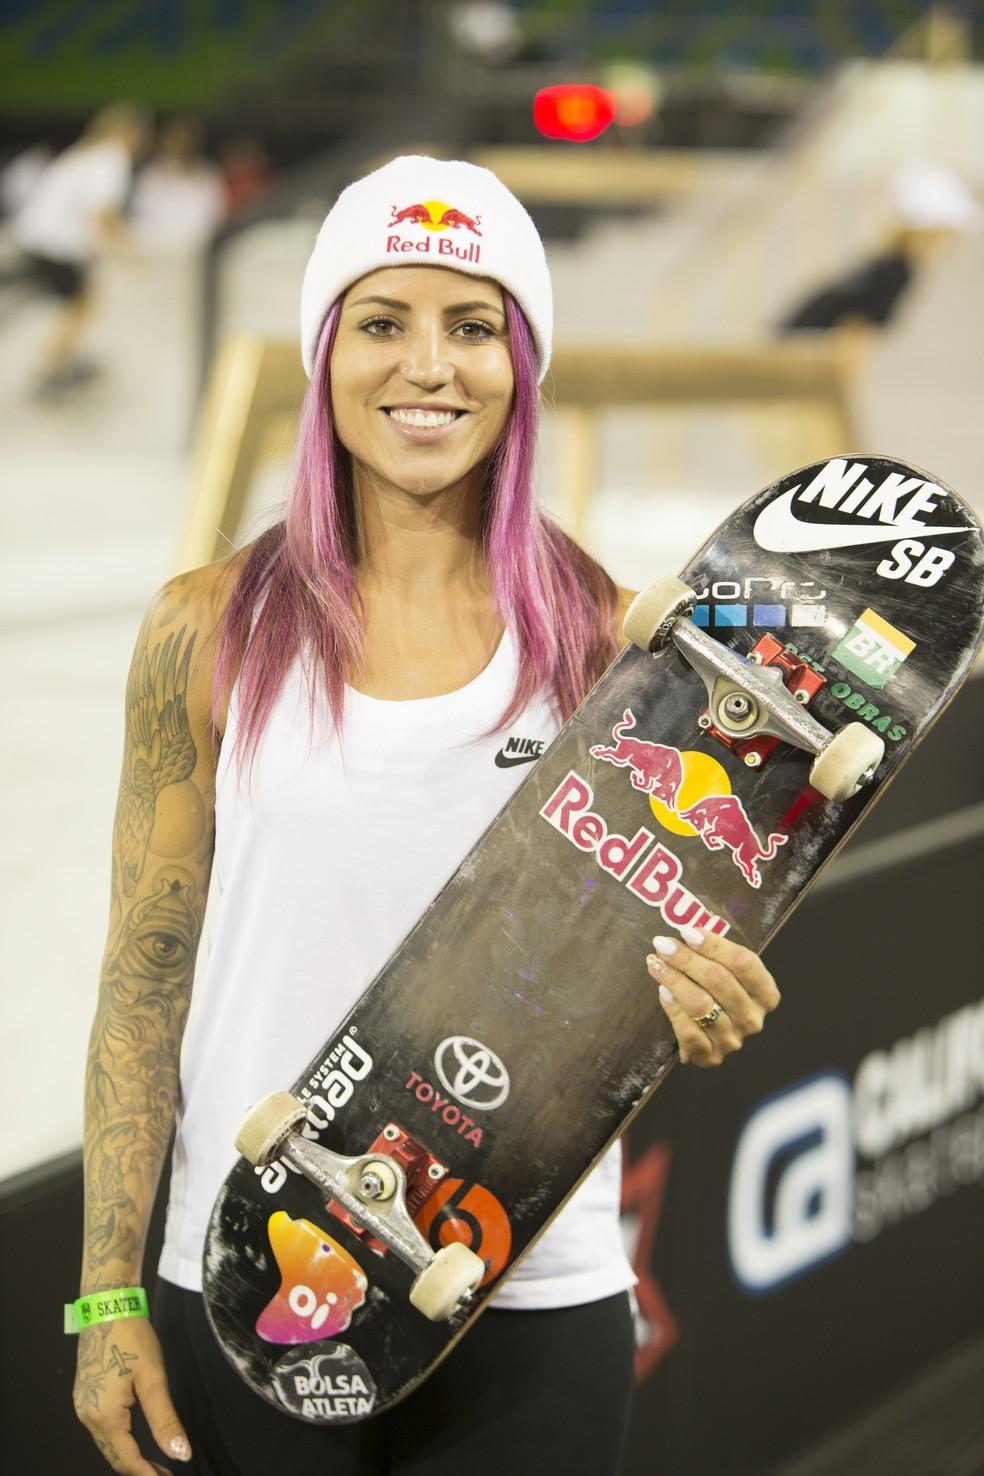 Letícia Bufoni precisa se recuperar no ranking para ir à Tóquio — Foto:  Paulo Macedo/Street League Skateboarding.